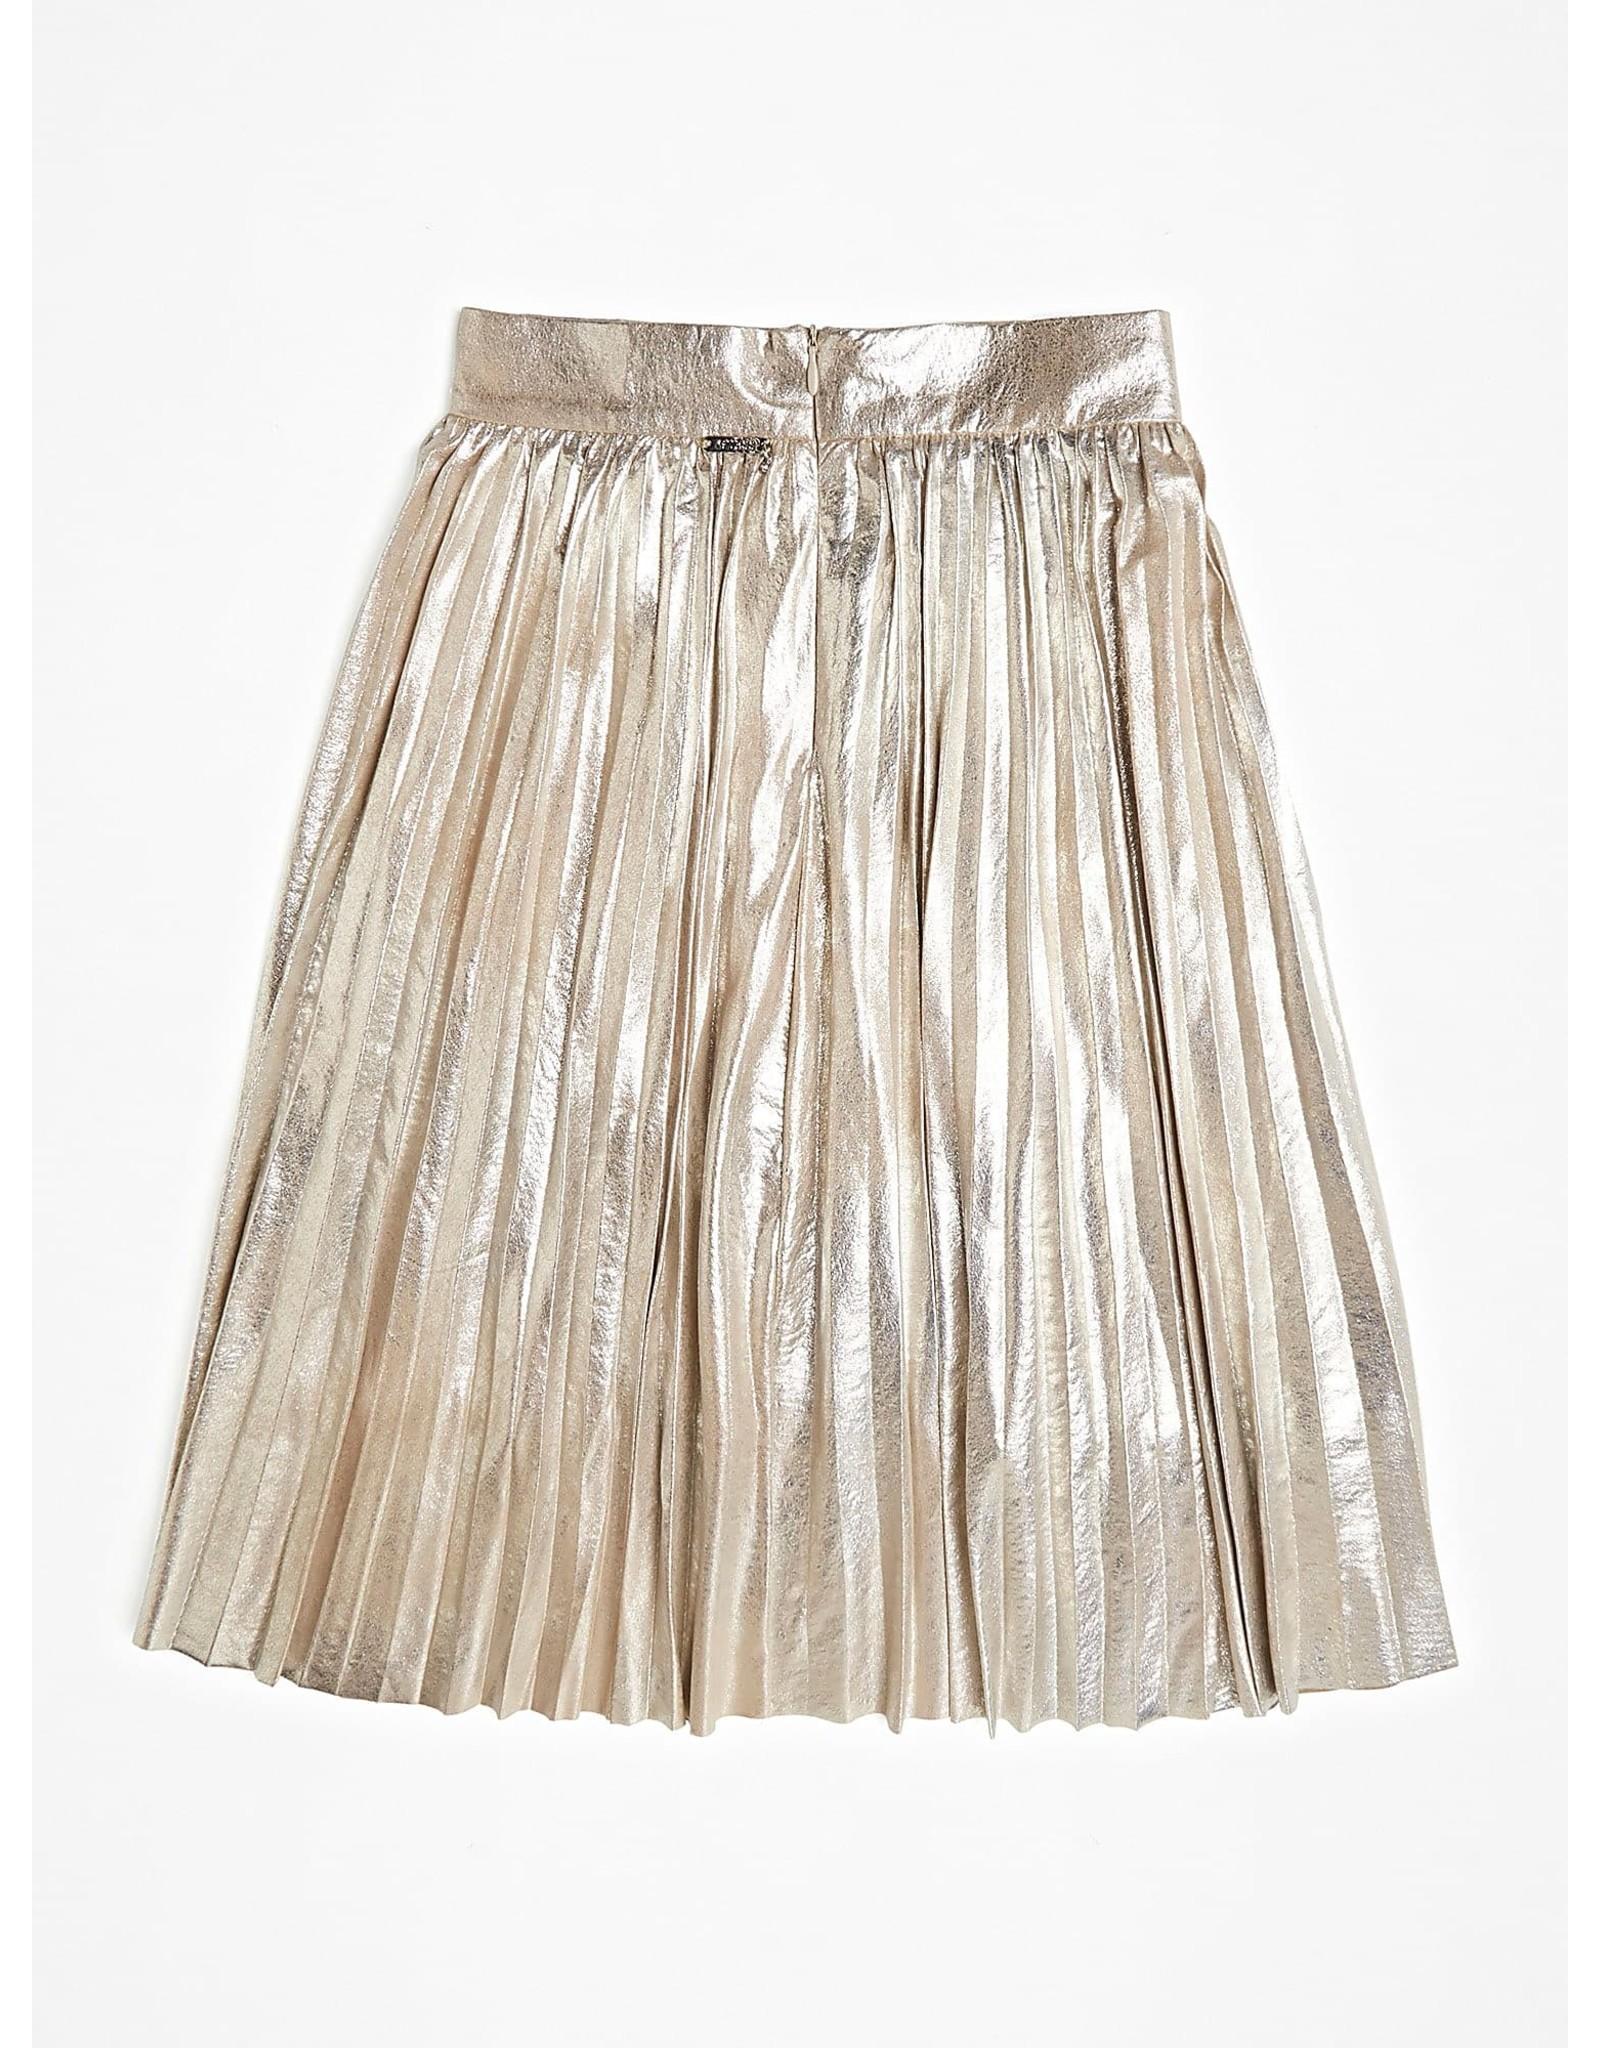 Guess Midi Skirt Gold